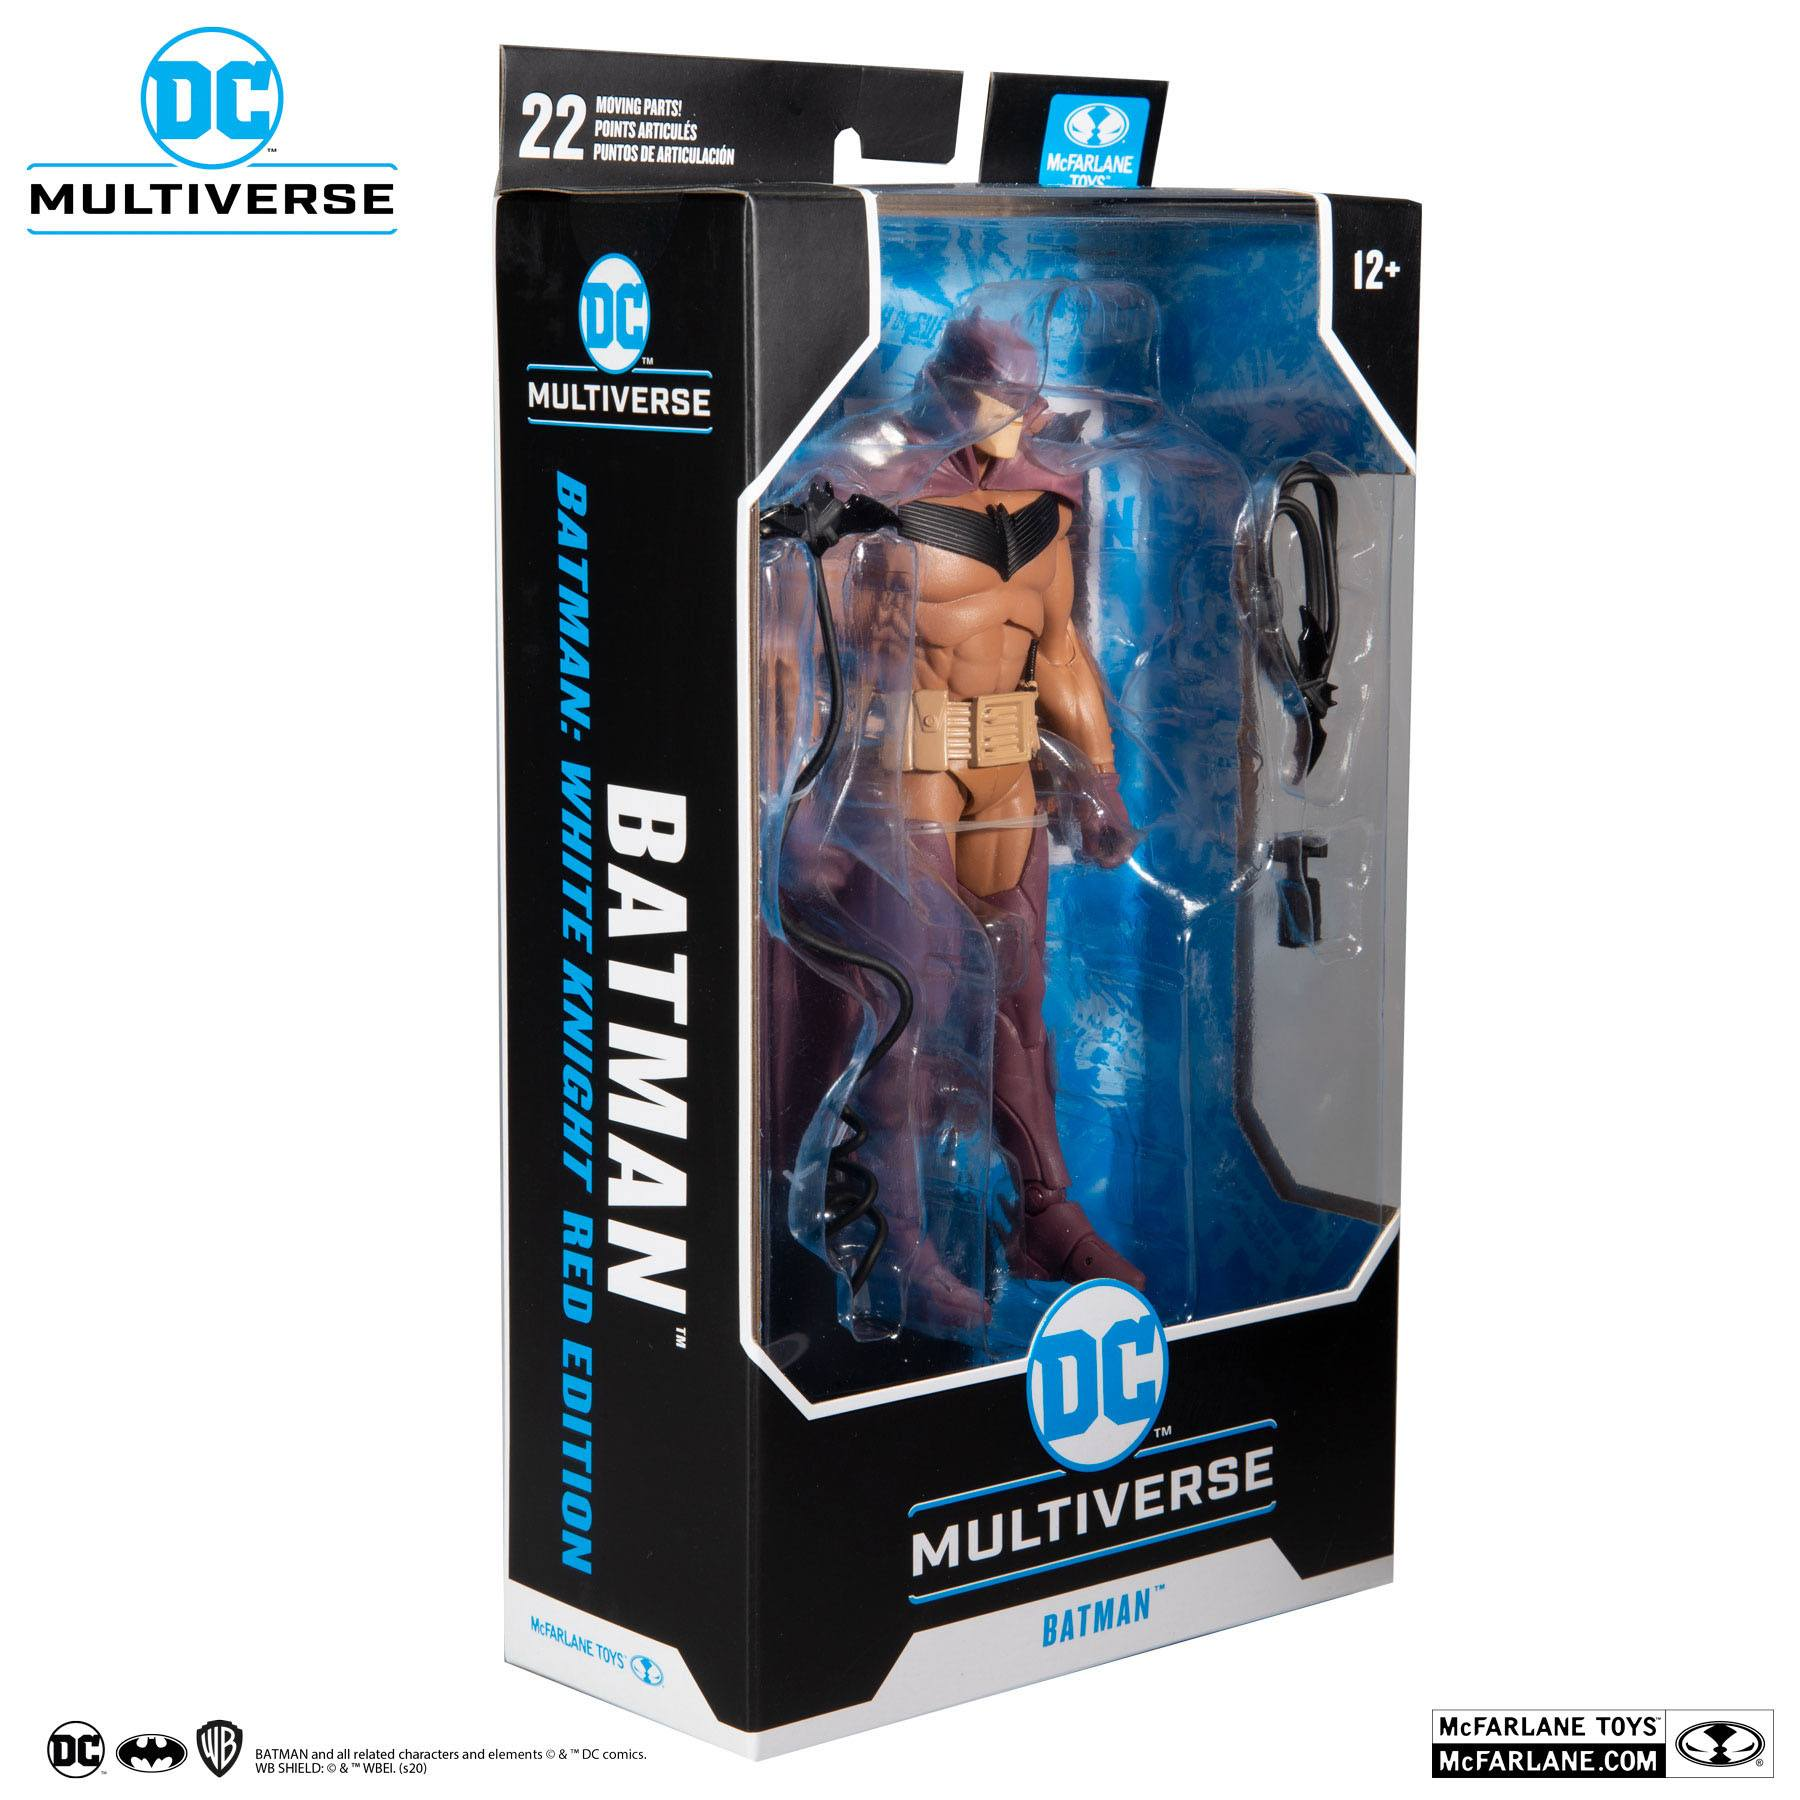 DC Multiverse Actionfigur White Knight Batman (Red Variant) 18 cm MCF15138-1 787926151381